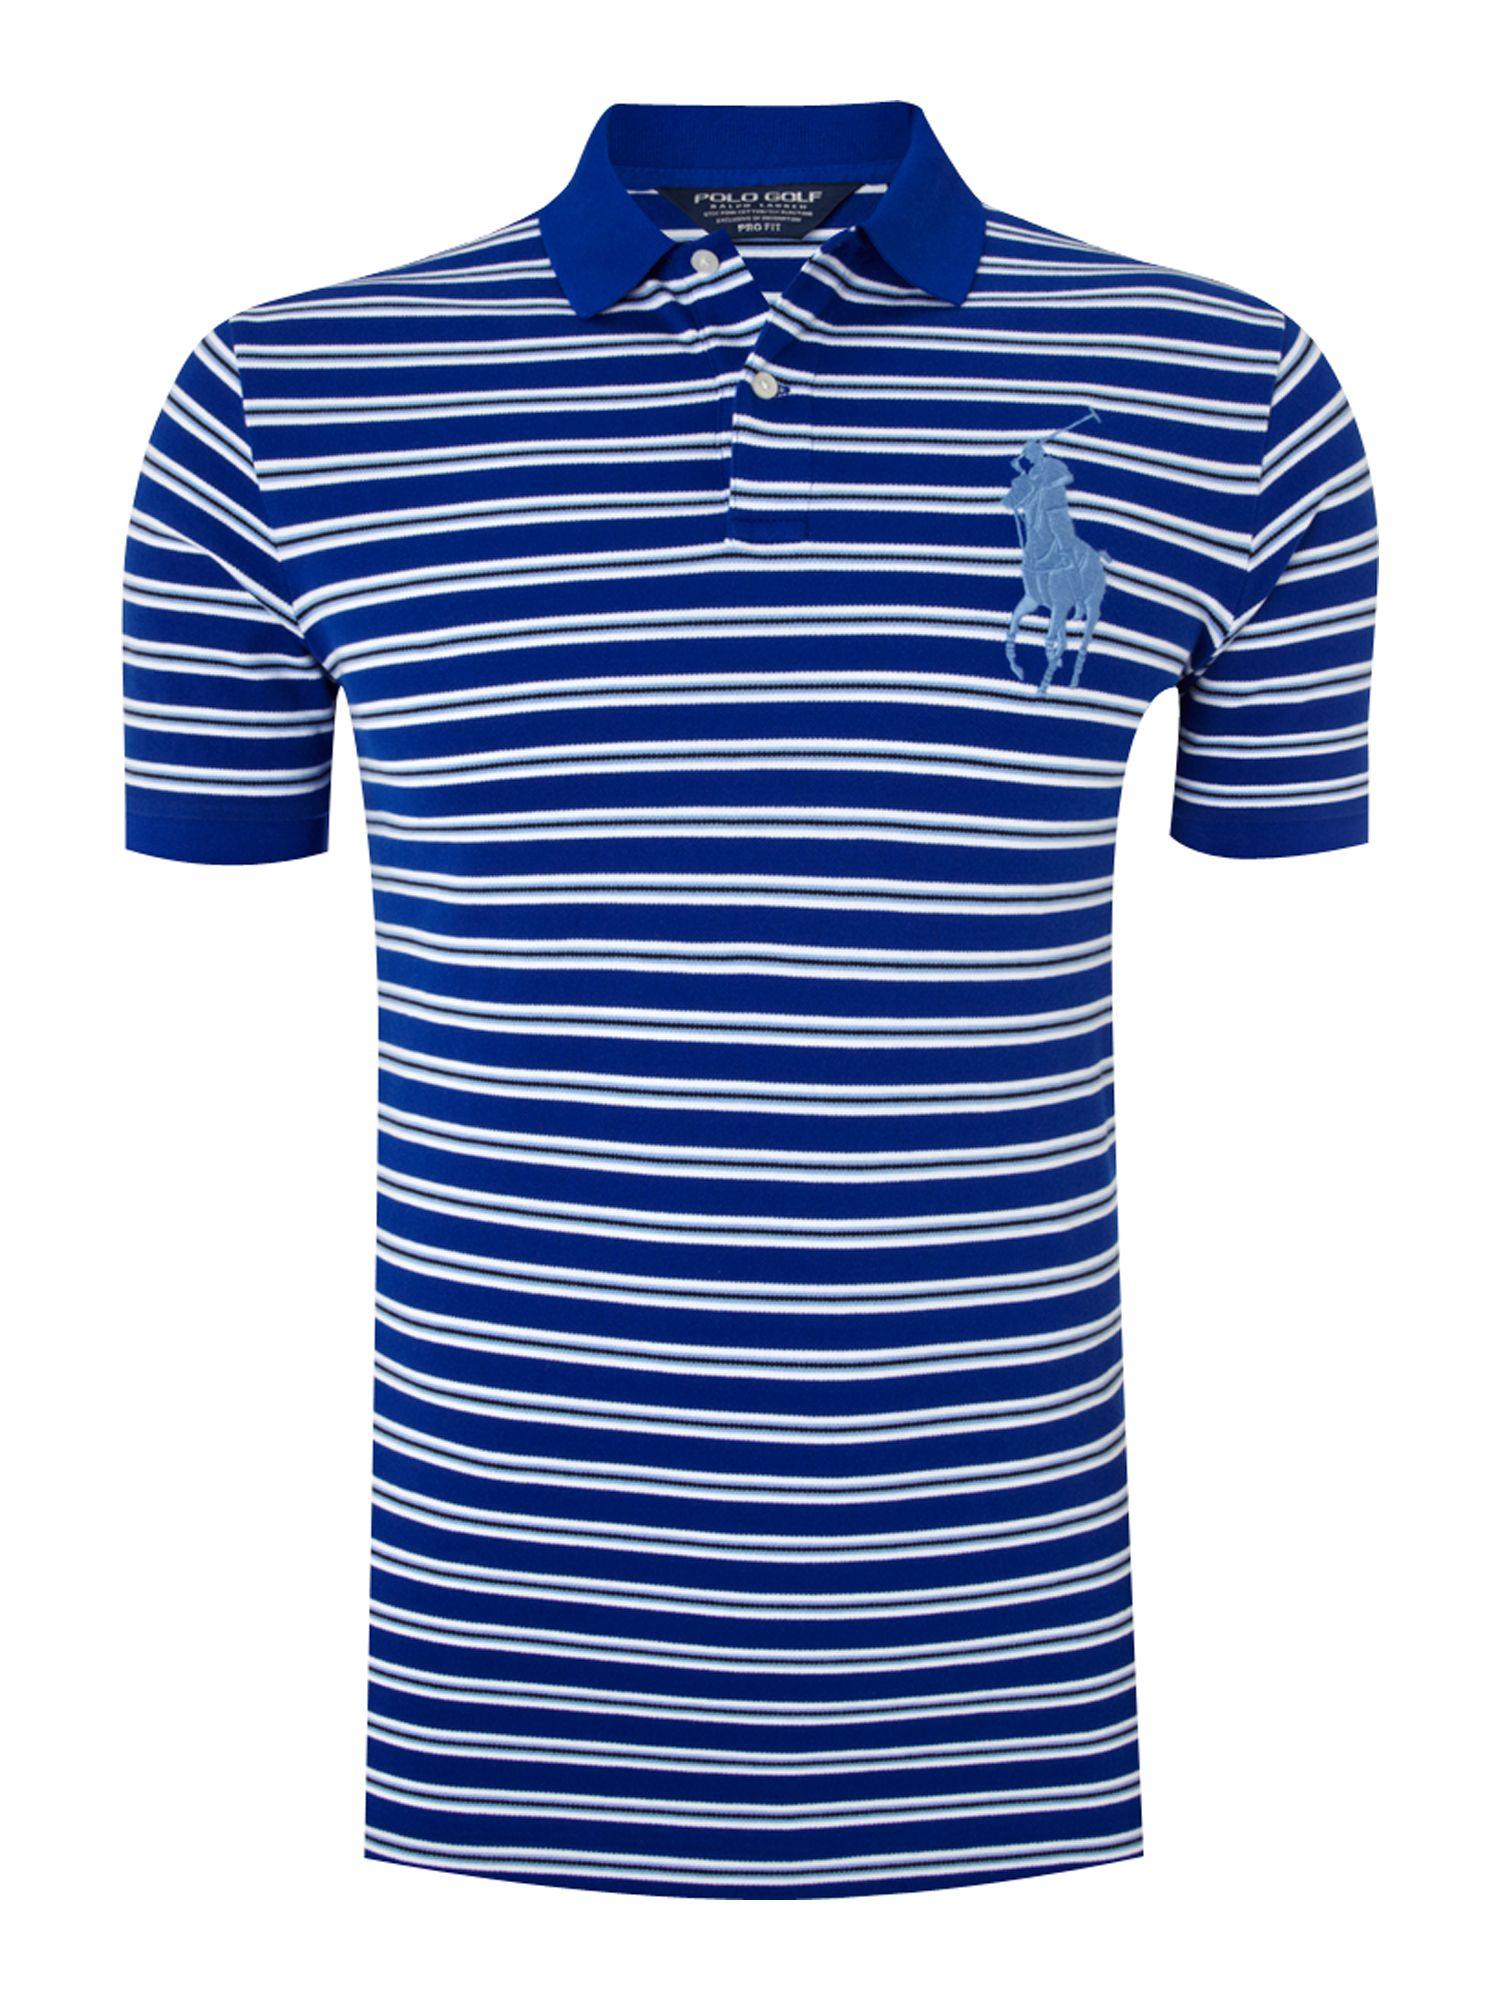 Polo Ralph Lauren Golf The Open Striped Polo Shirt in Blue ...